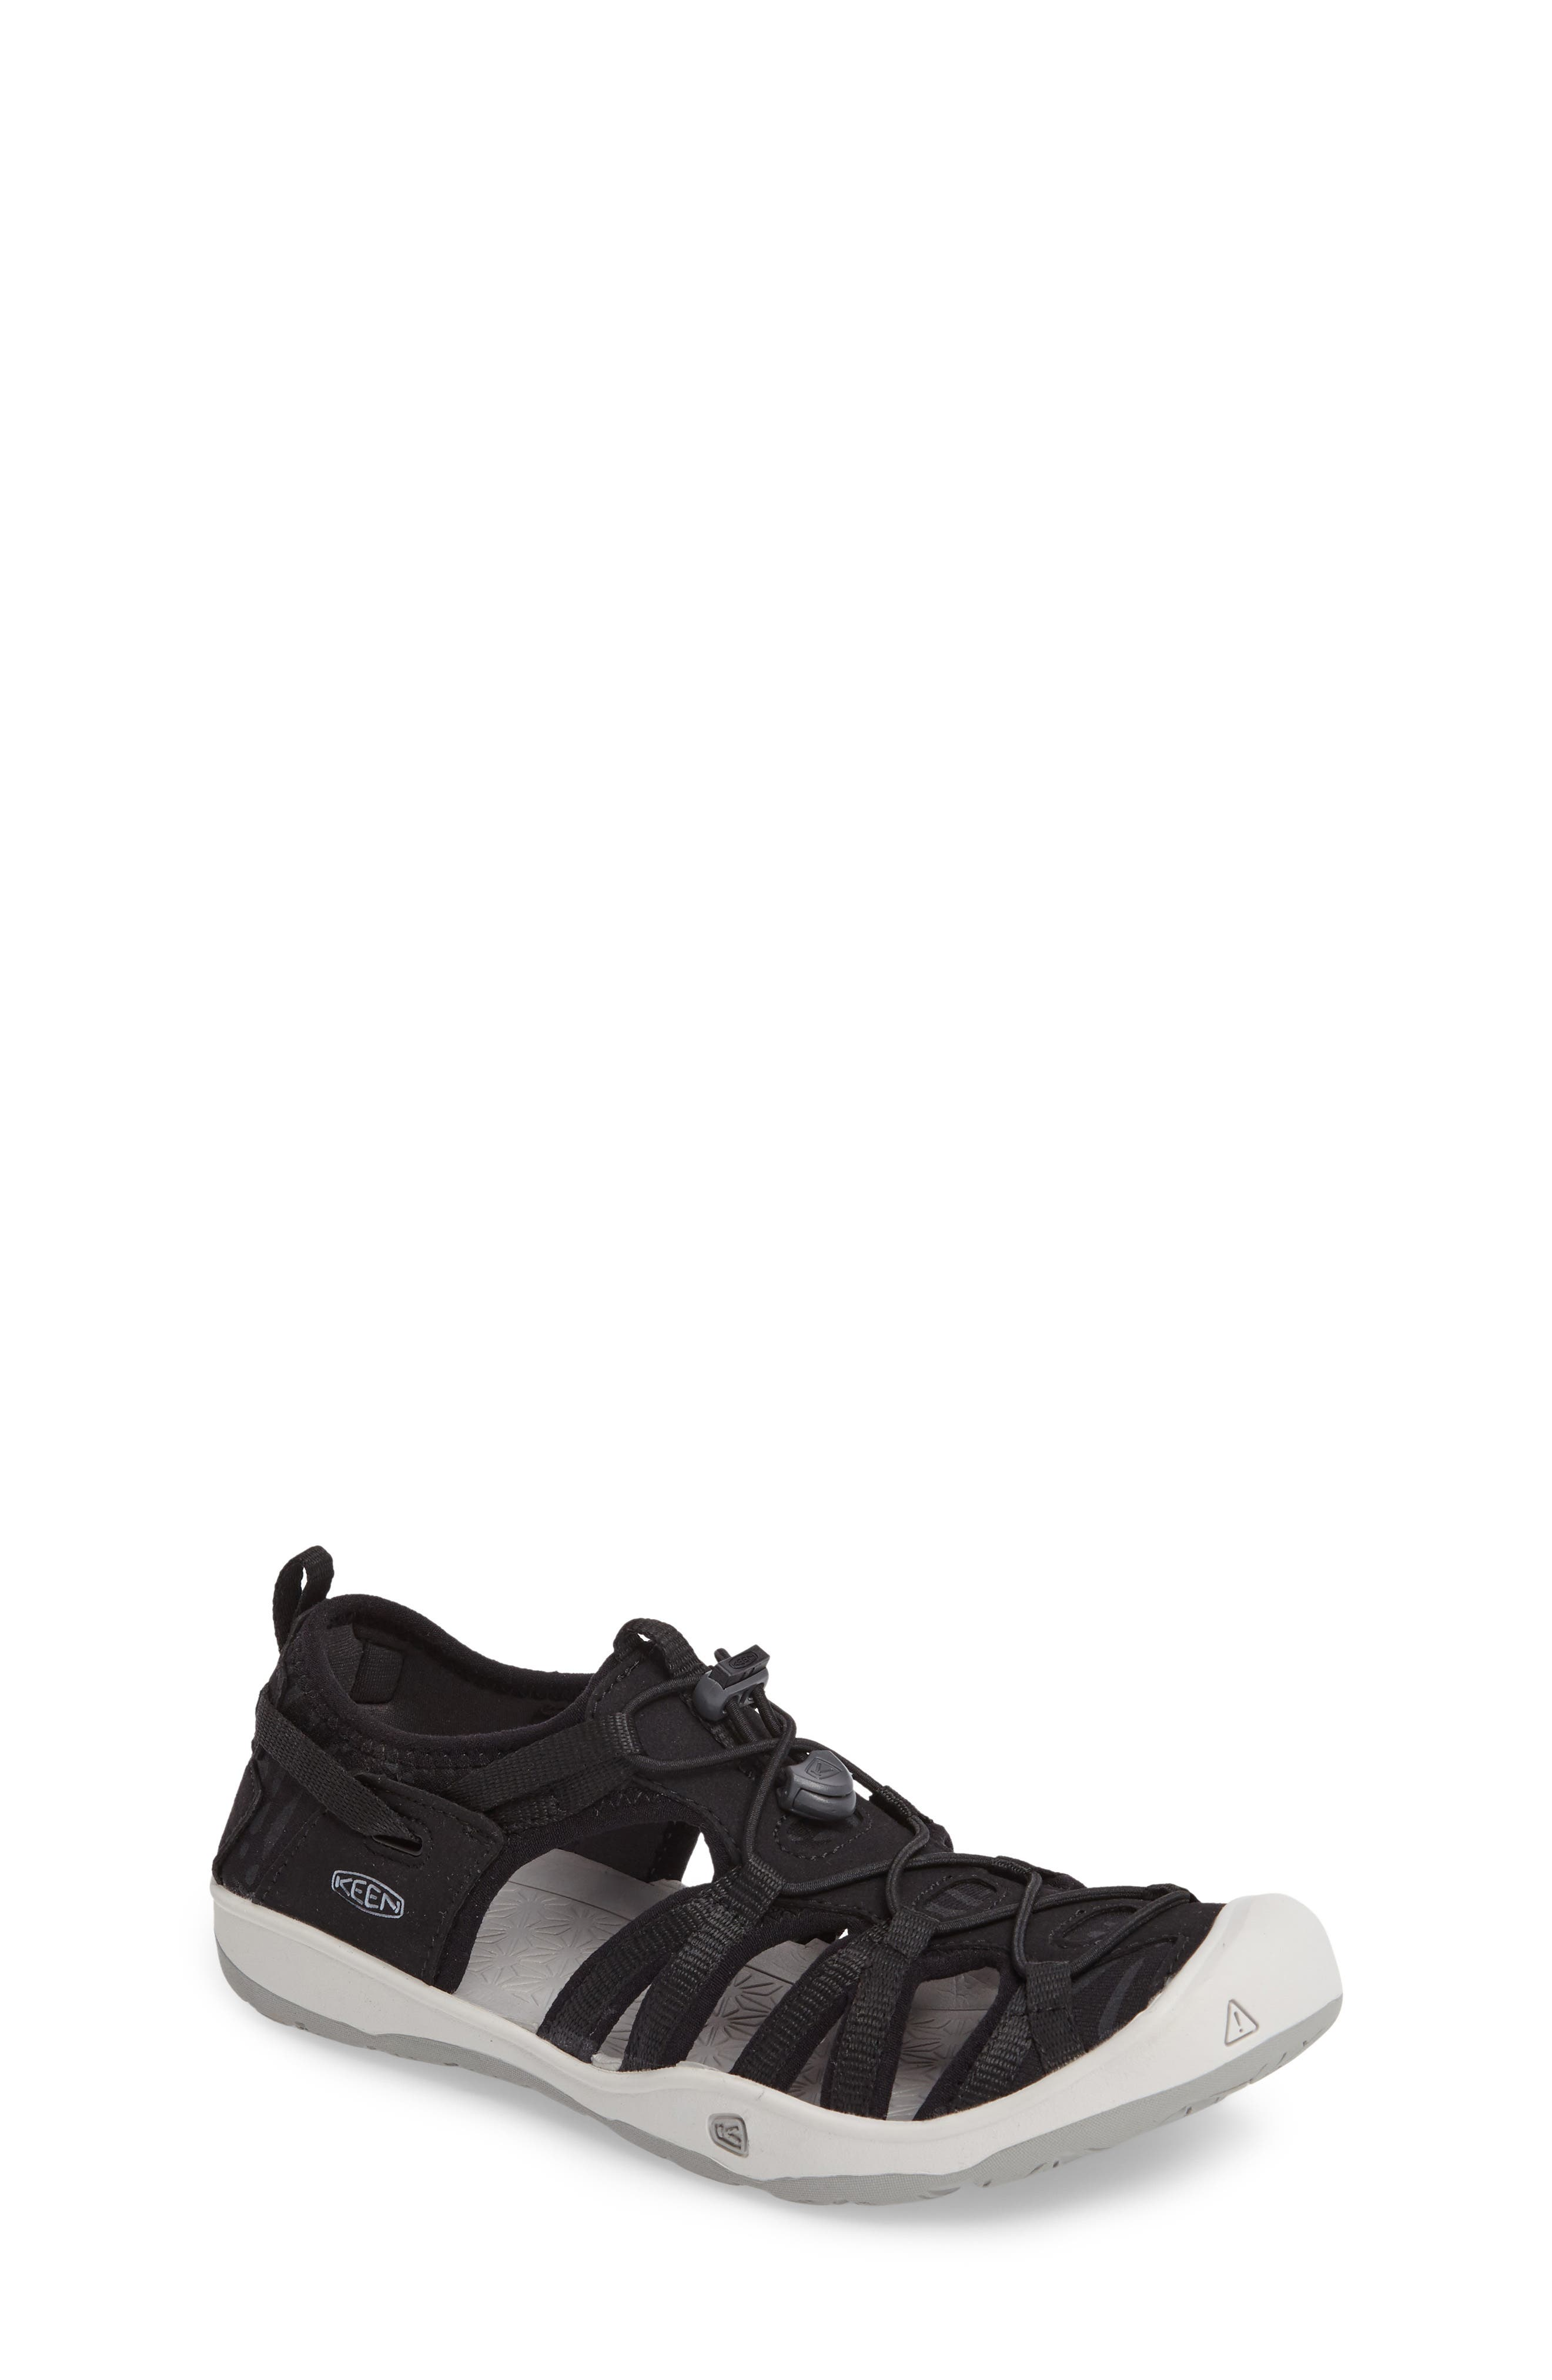 KEEN, Moxie Water Friendly Sandal, Main thumbnail 1, color, BLACK/ VAPOR